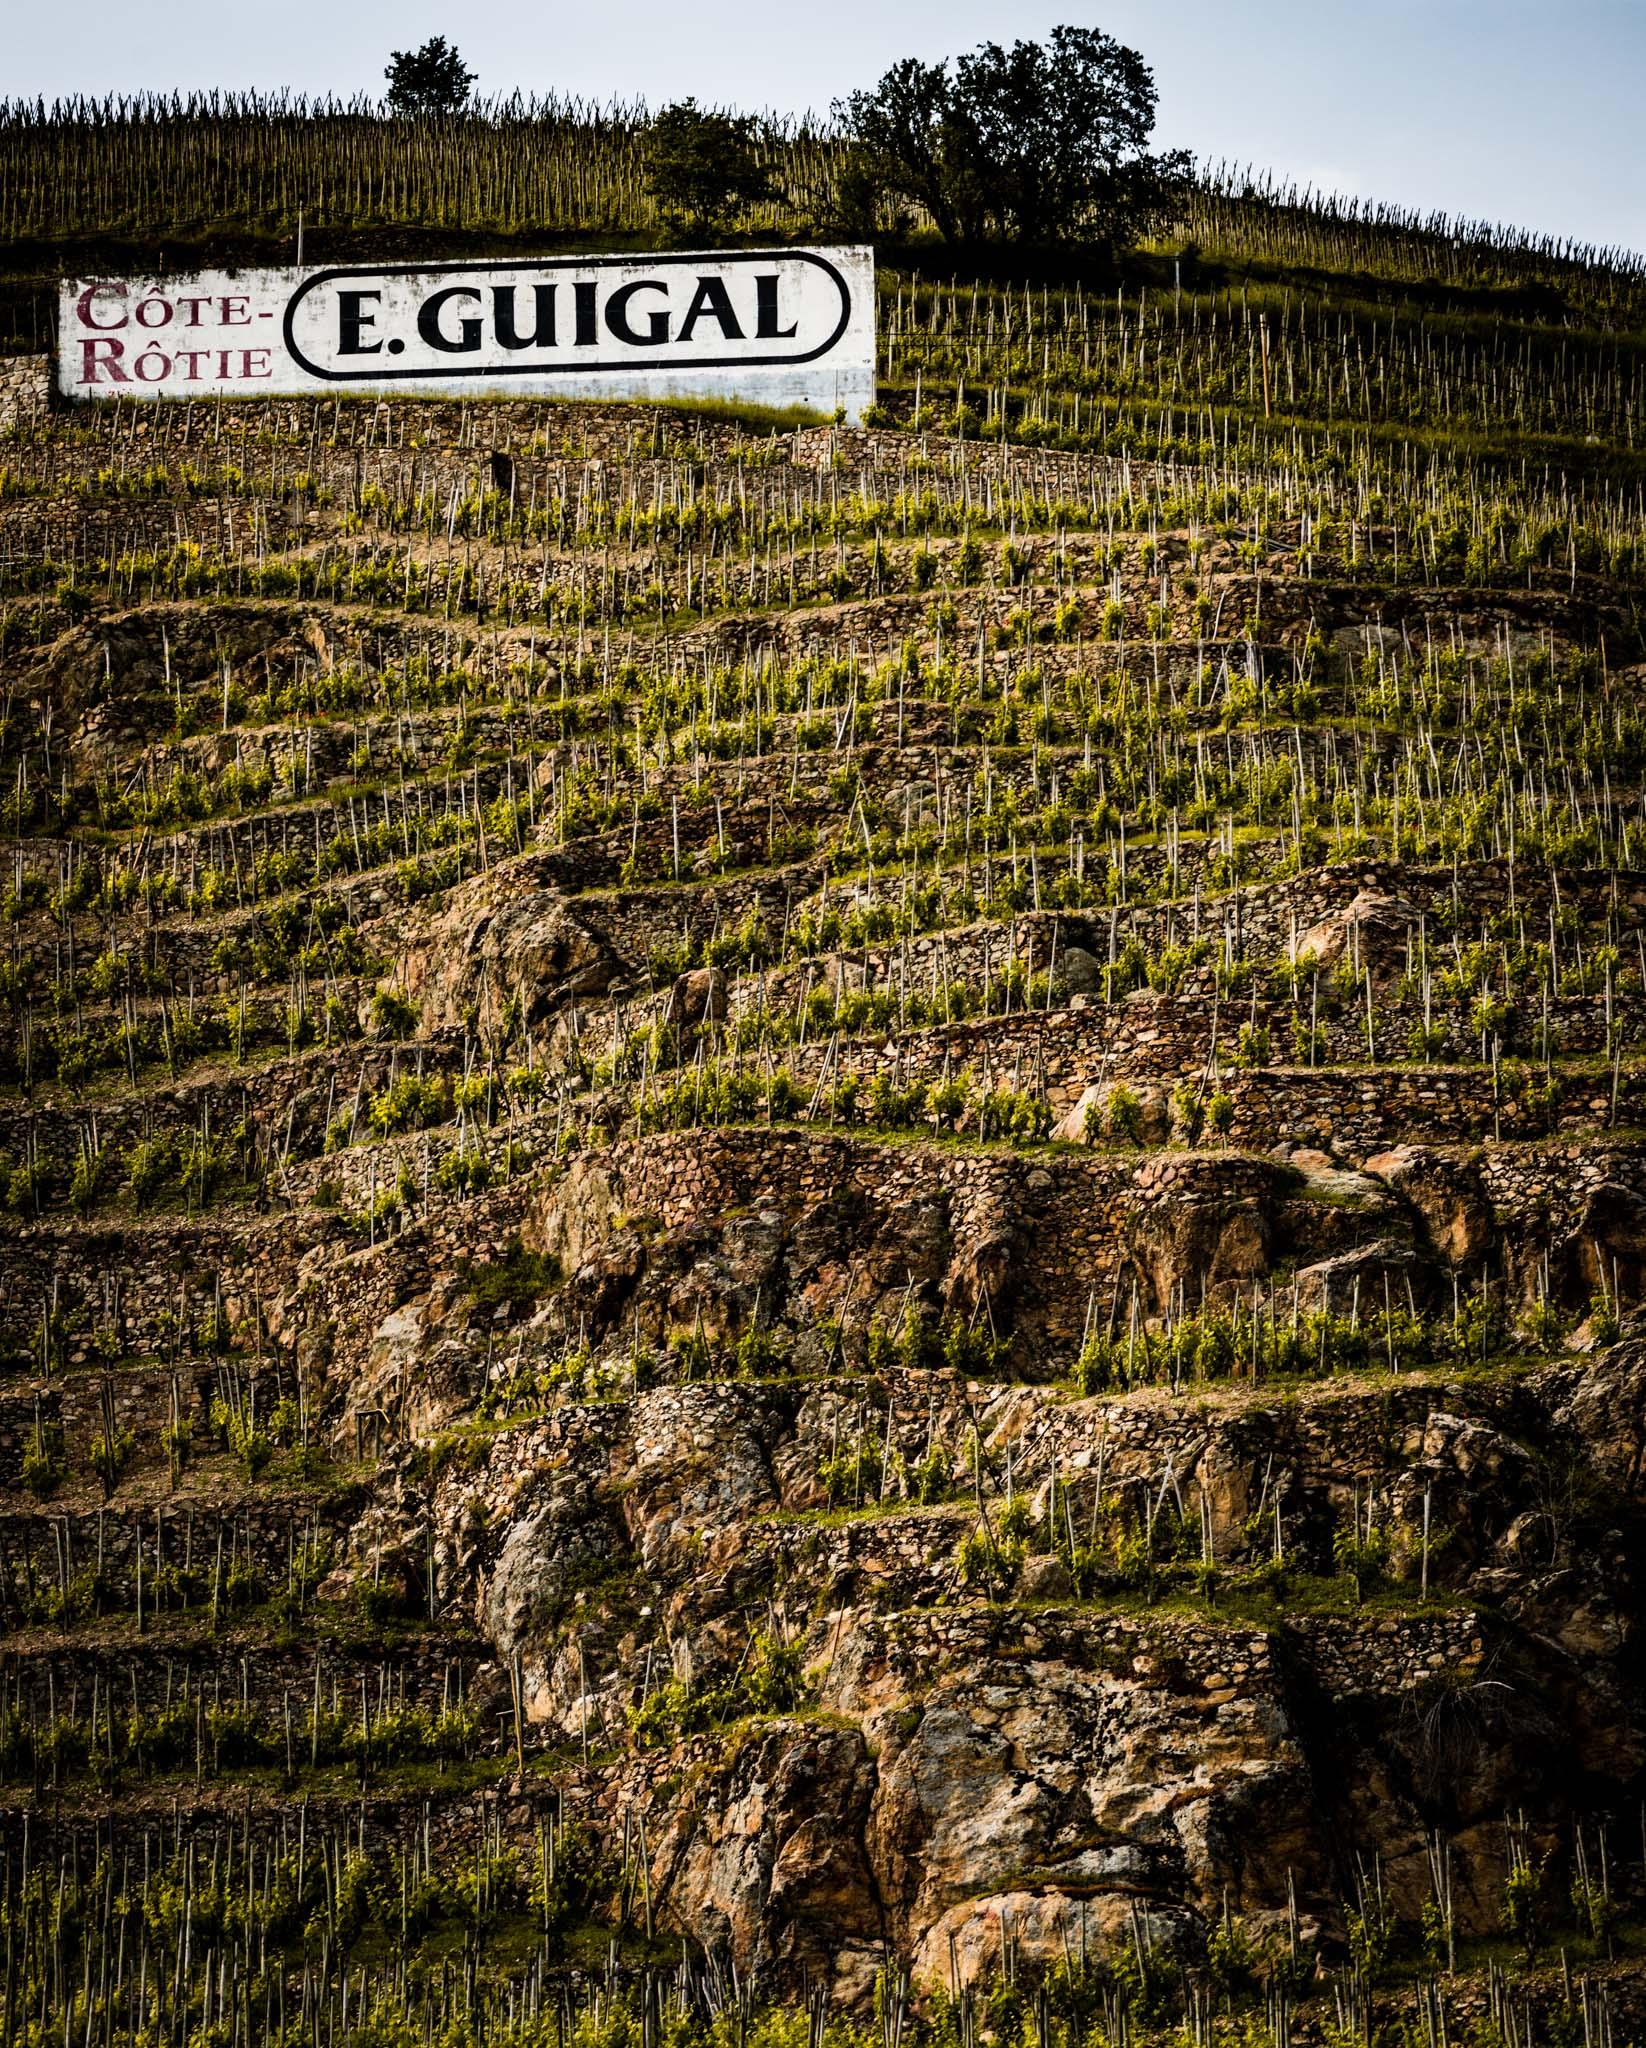 France : Northern Rhone : Guigal's La Mouline vineyard on the Cote Blonde in Cote Rotie